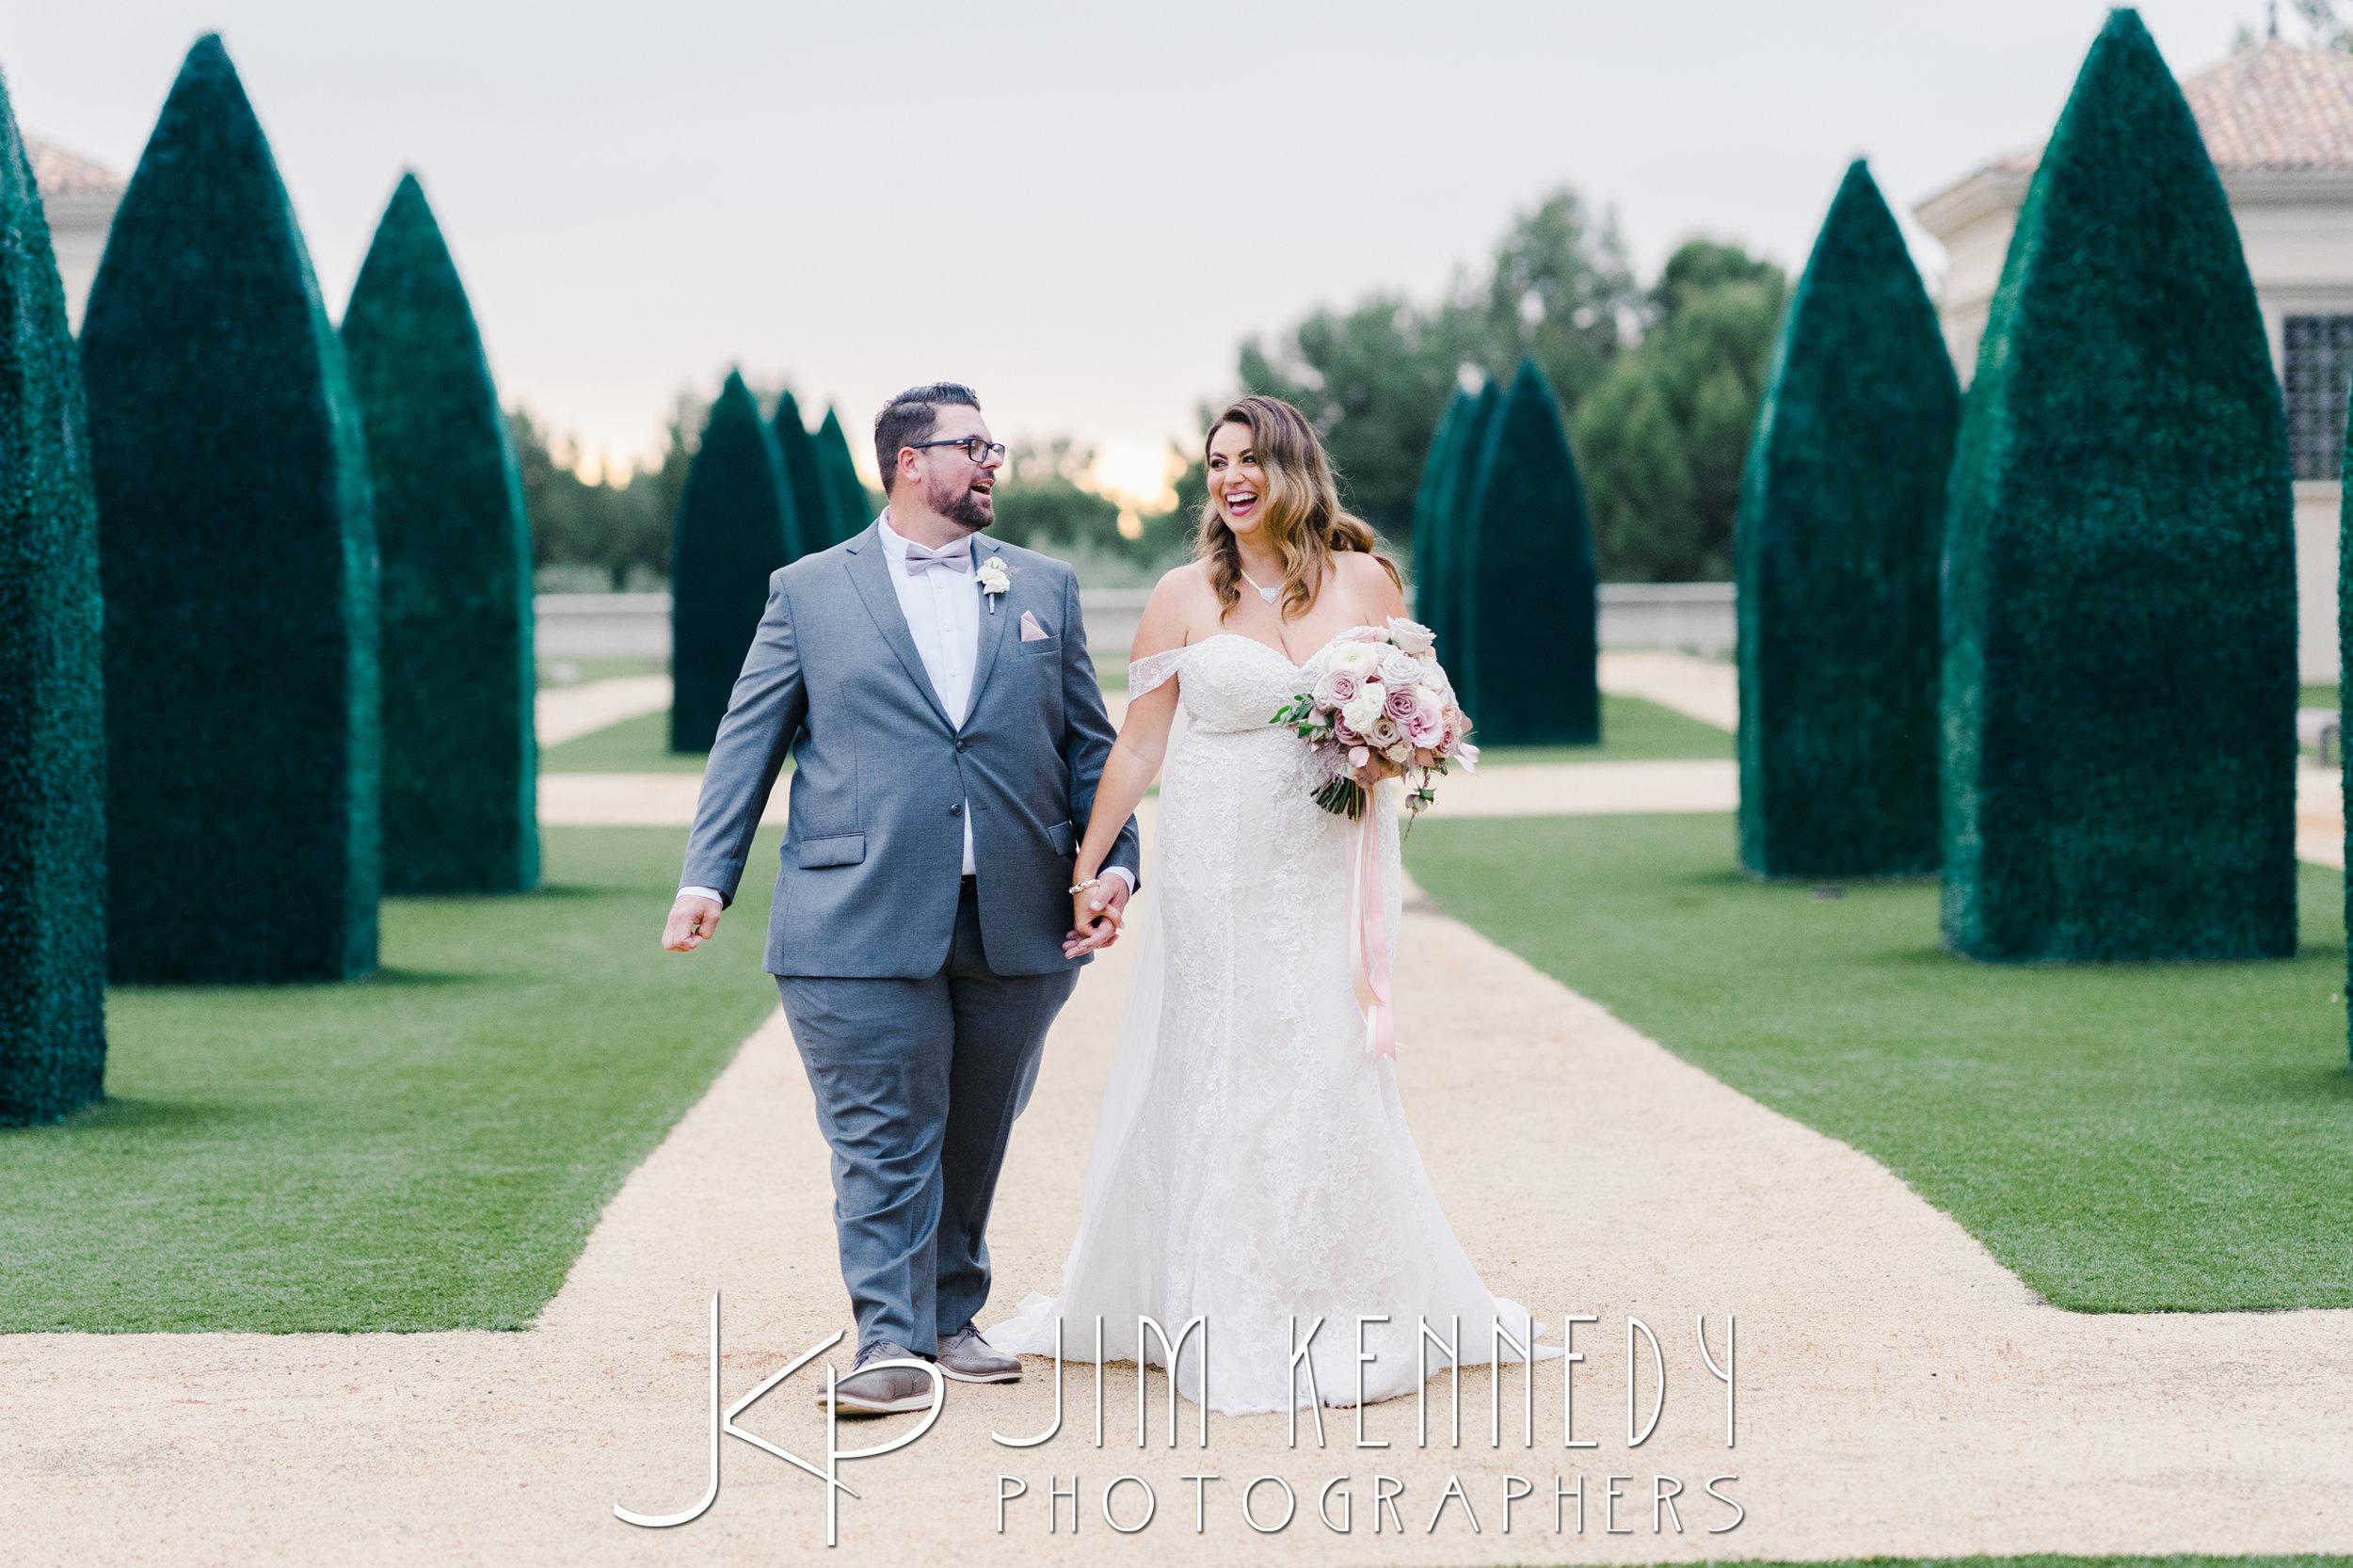 pelican-hill-wedding-jim-kenedy-photographers_0172.JPG